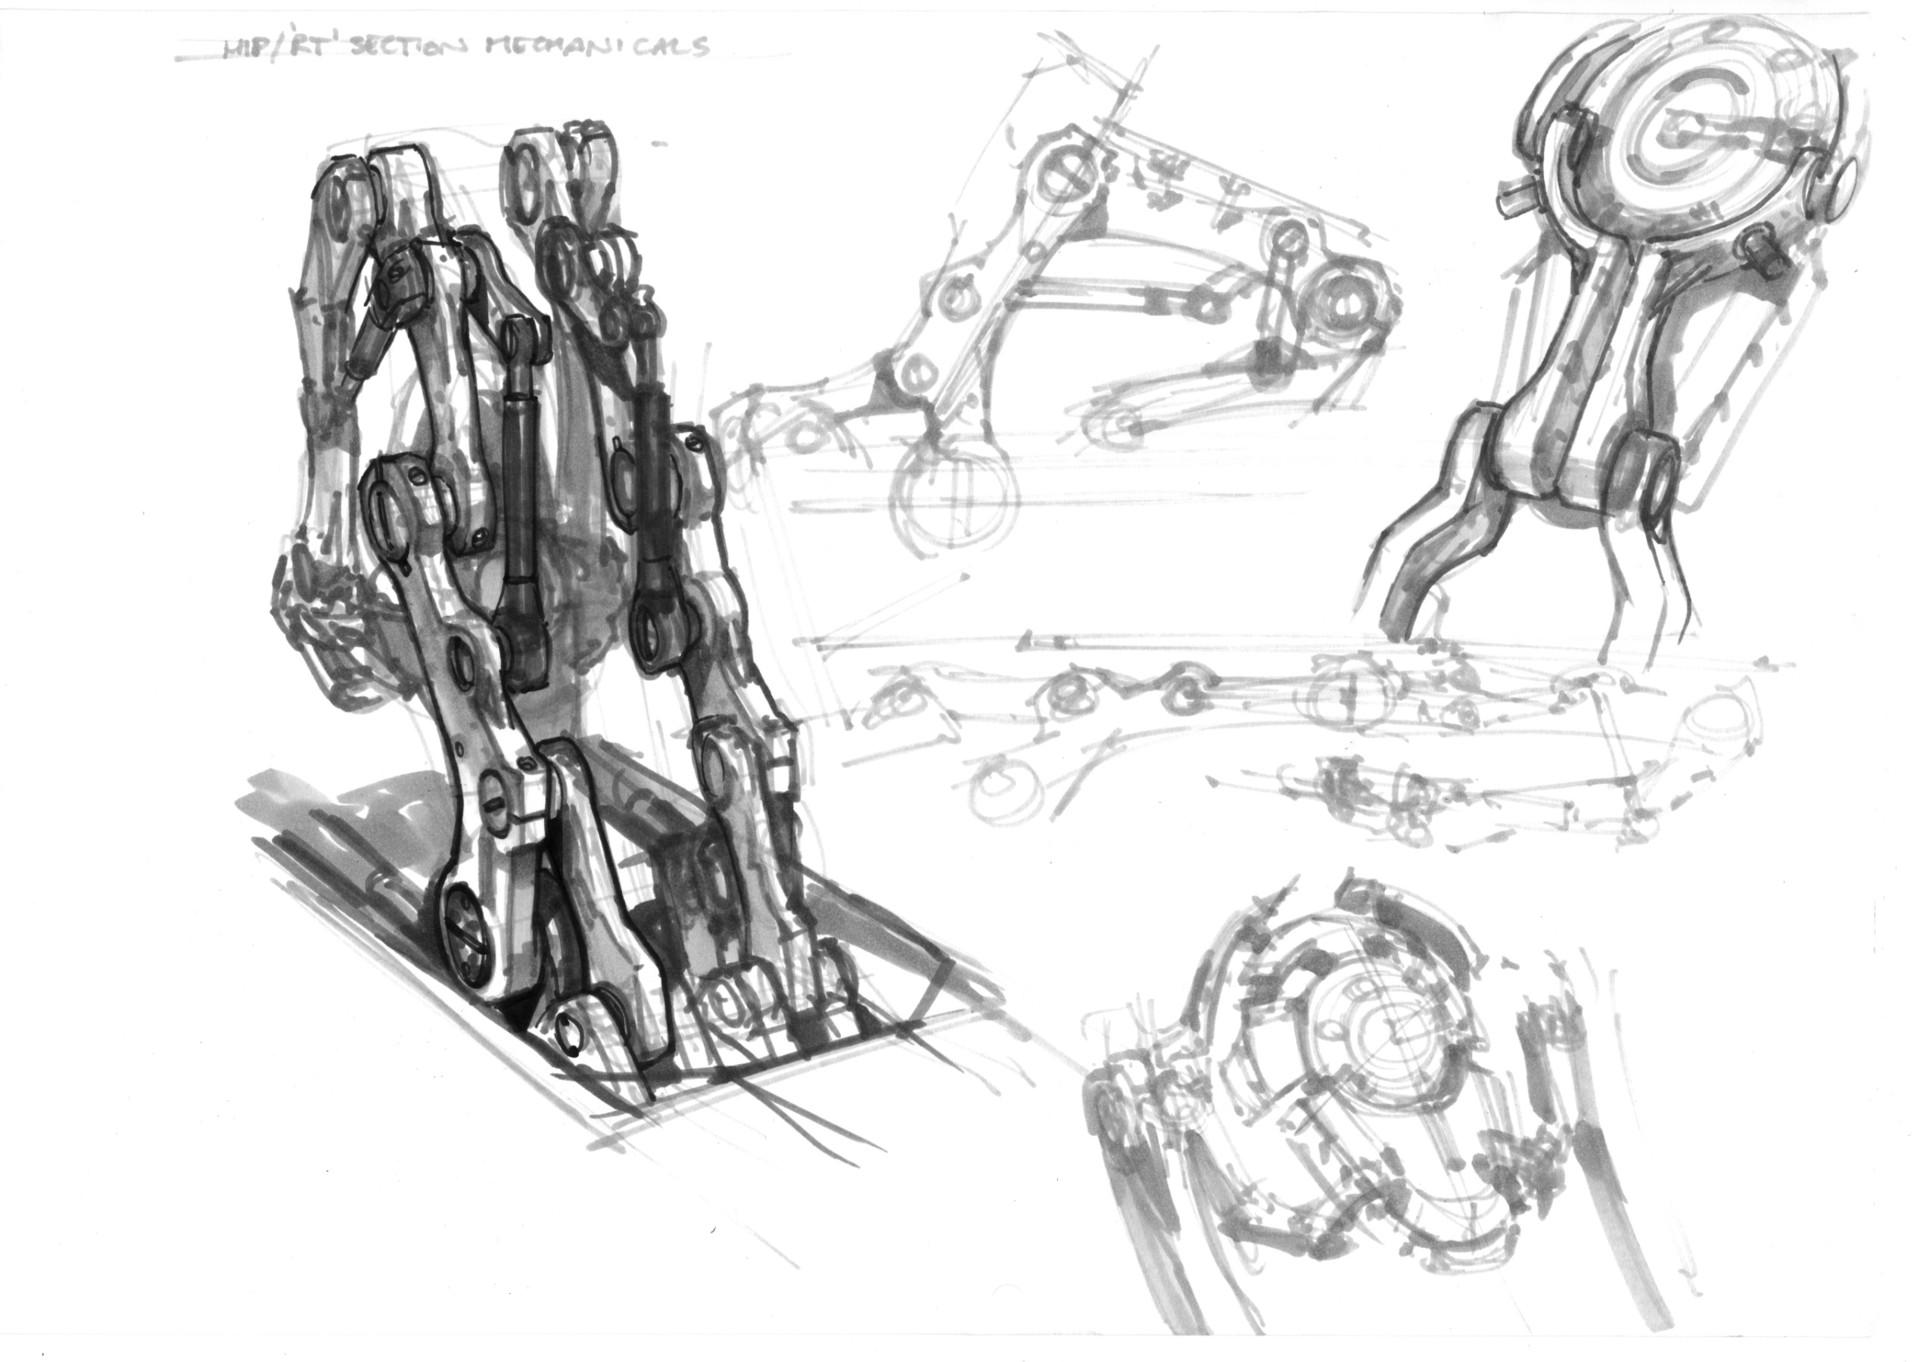 Phil saunders suit up sketch11